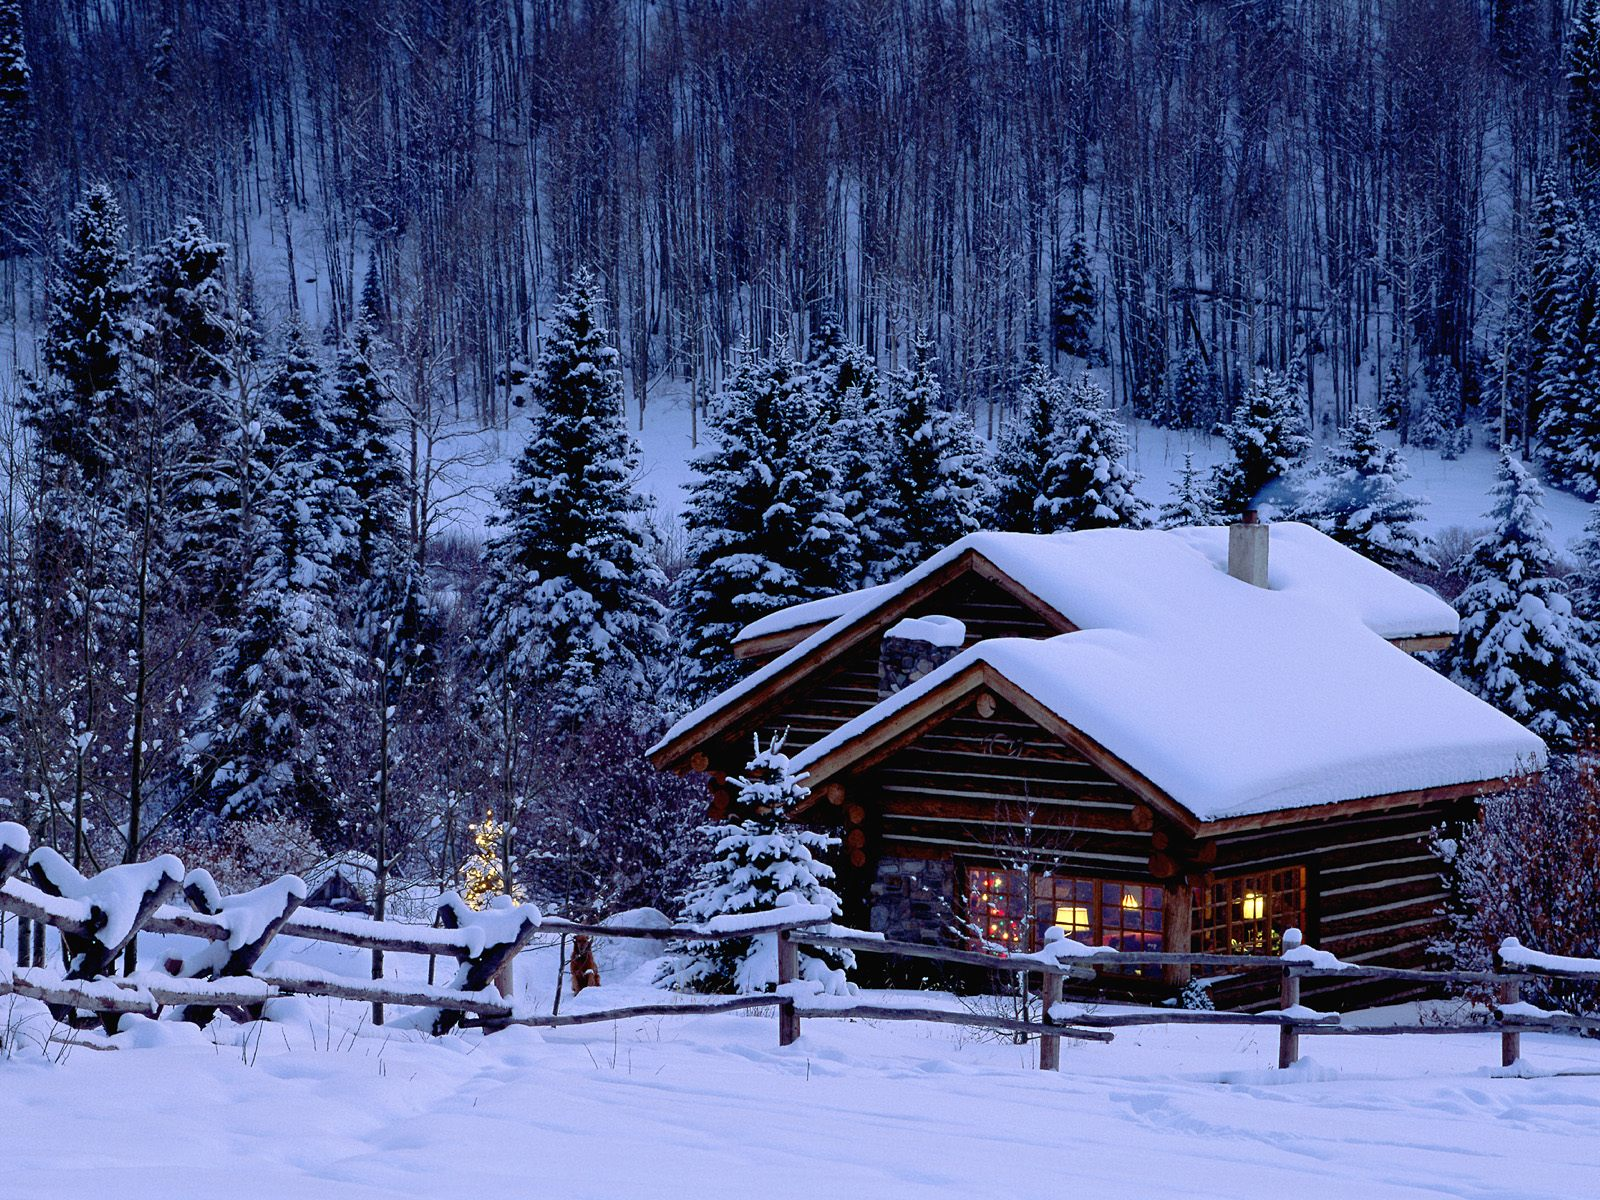 Christmas wallpaper, Free Wallpaper Downloads: Winter Wallpaper HD For ...